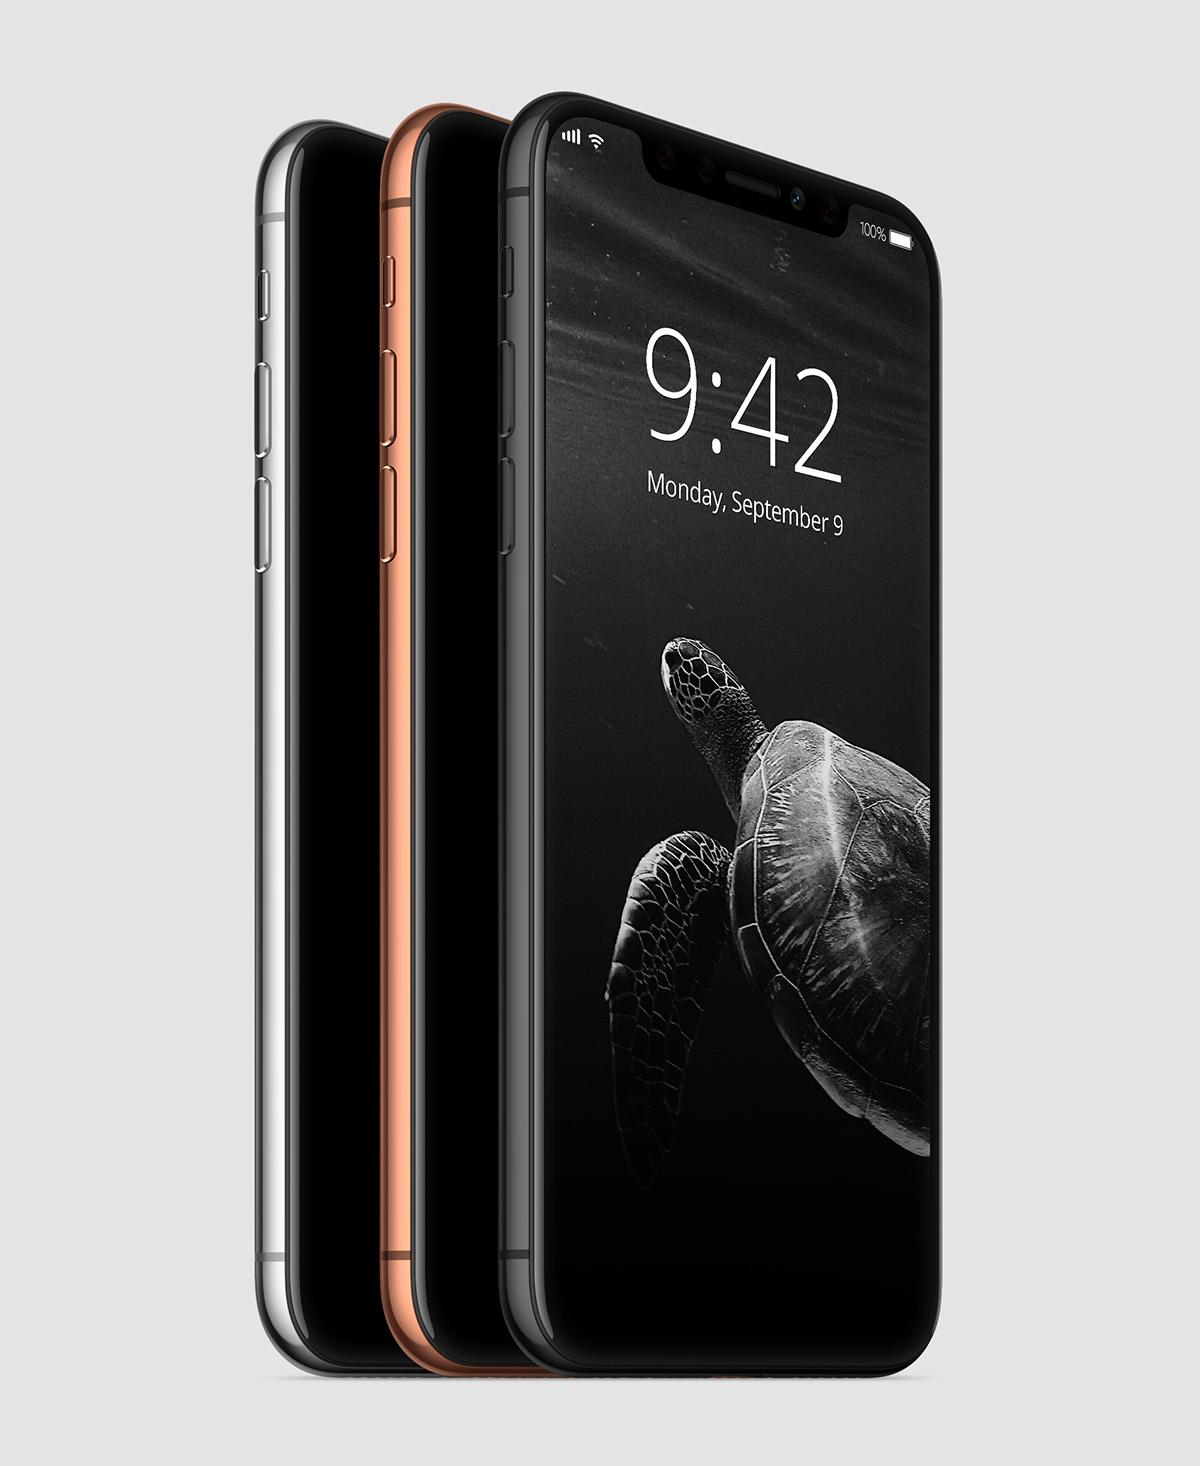 iPhone8ソフトバンク版をキャッシュバック付で損せず購入する方法【MNP・乗り換えキャンペーン】